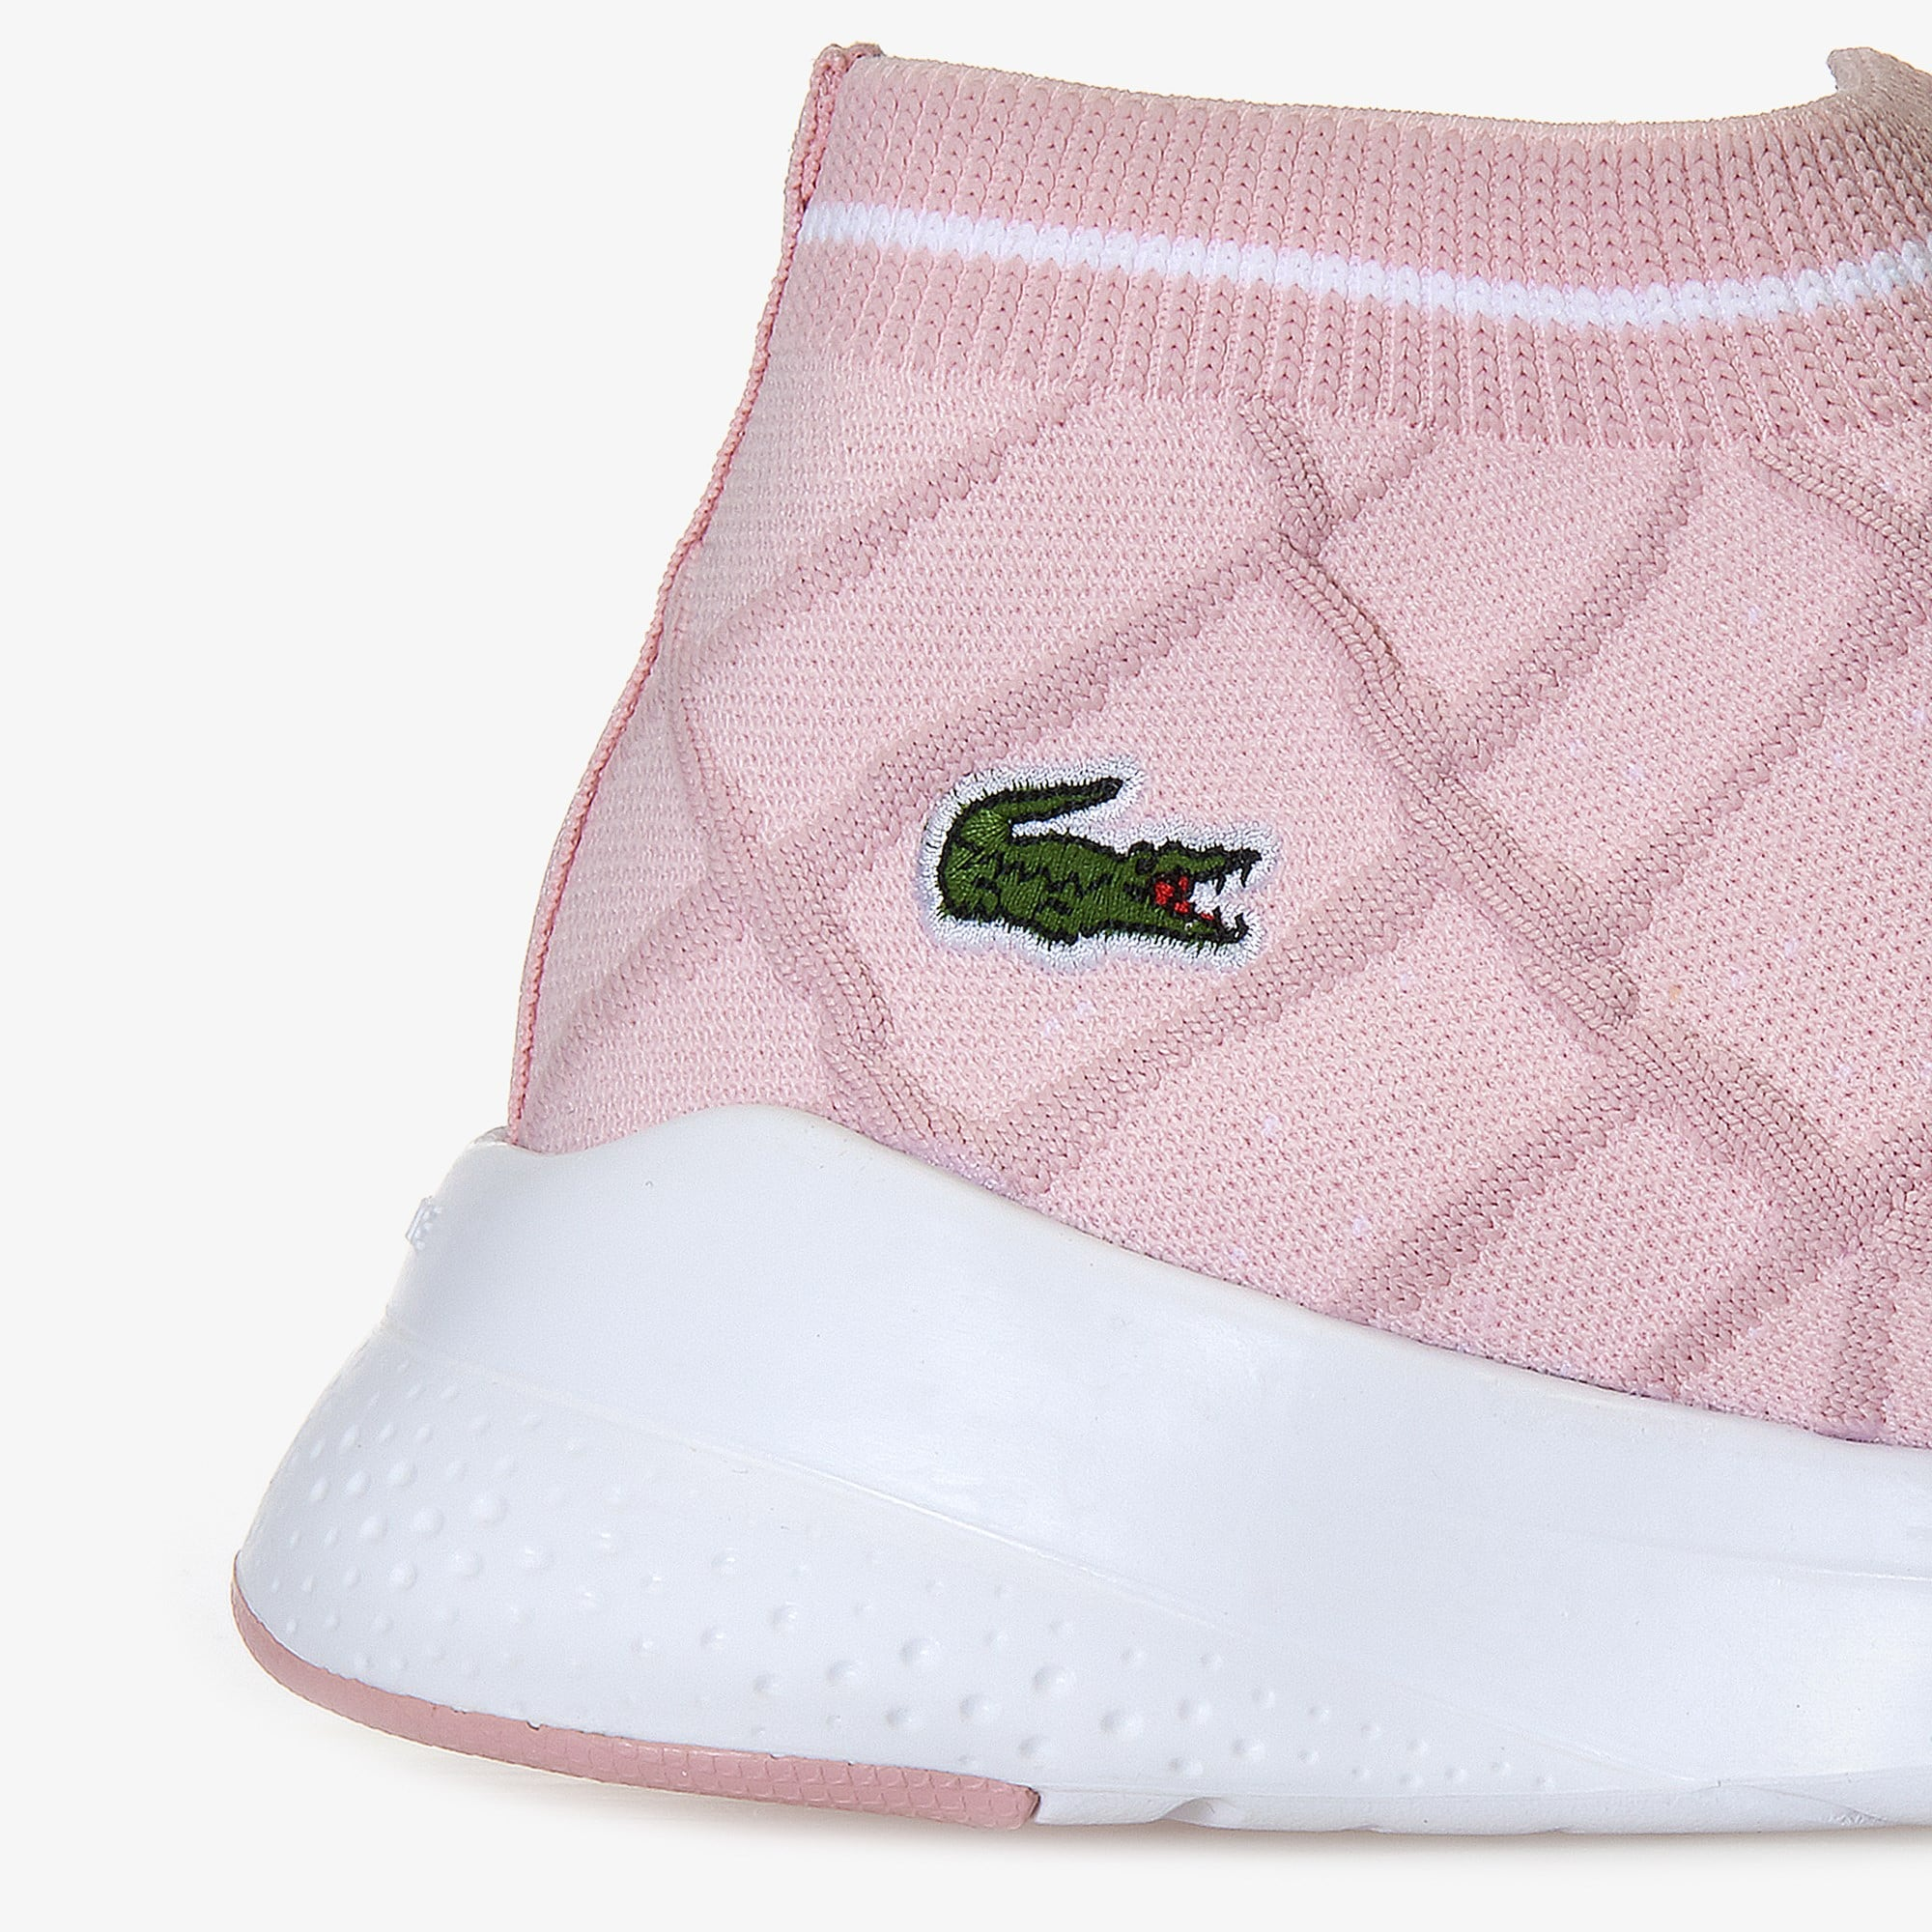 90ee8856 Women's LT Fit Sock Textile Trainers | LACOSTE